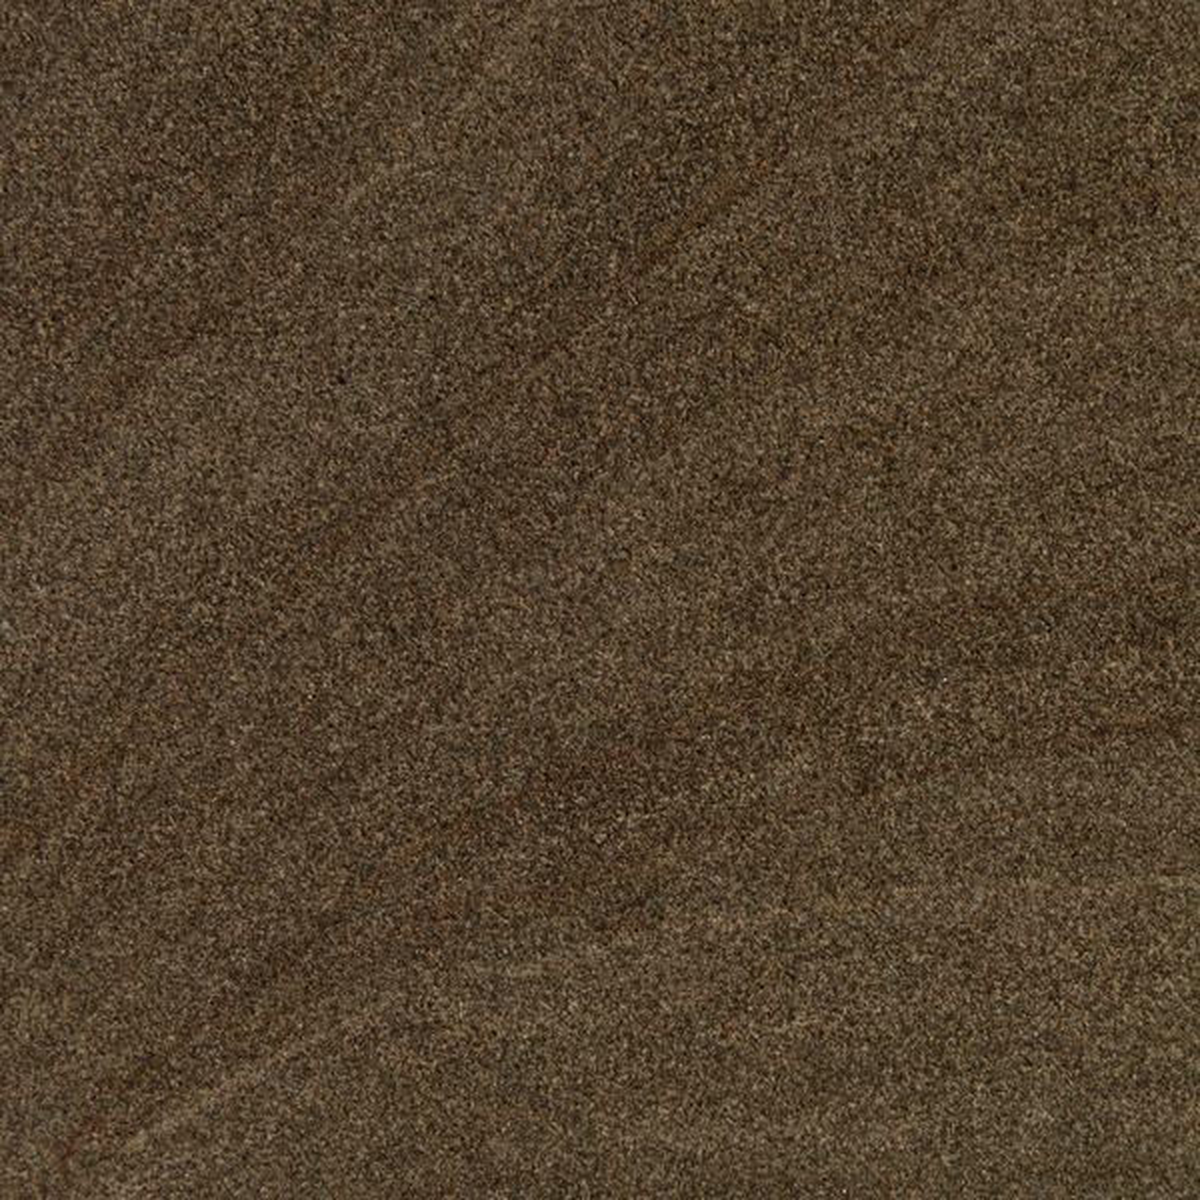 Wetwall Italian Levanto Sand Shower Panel